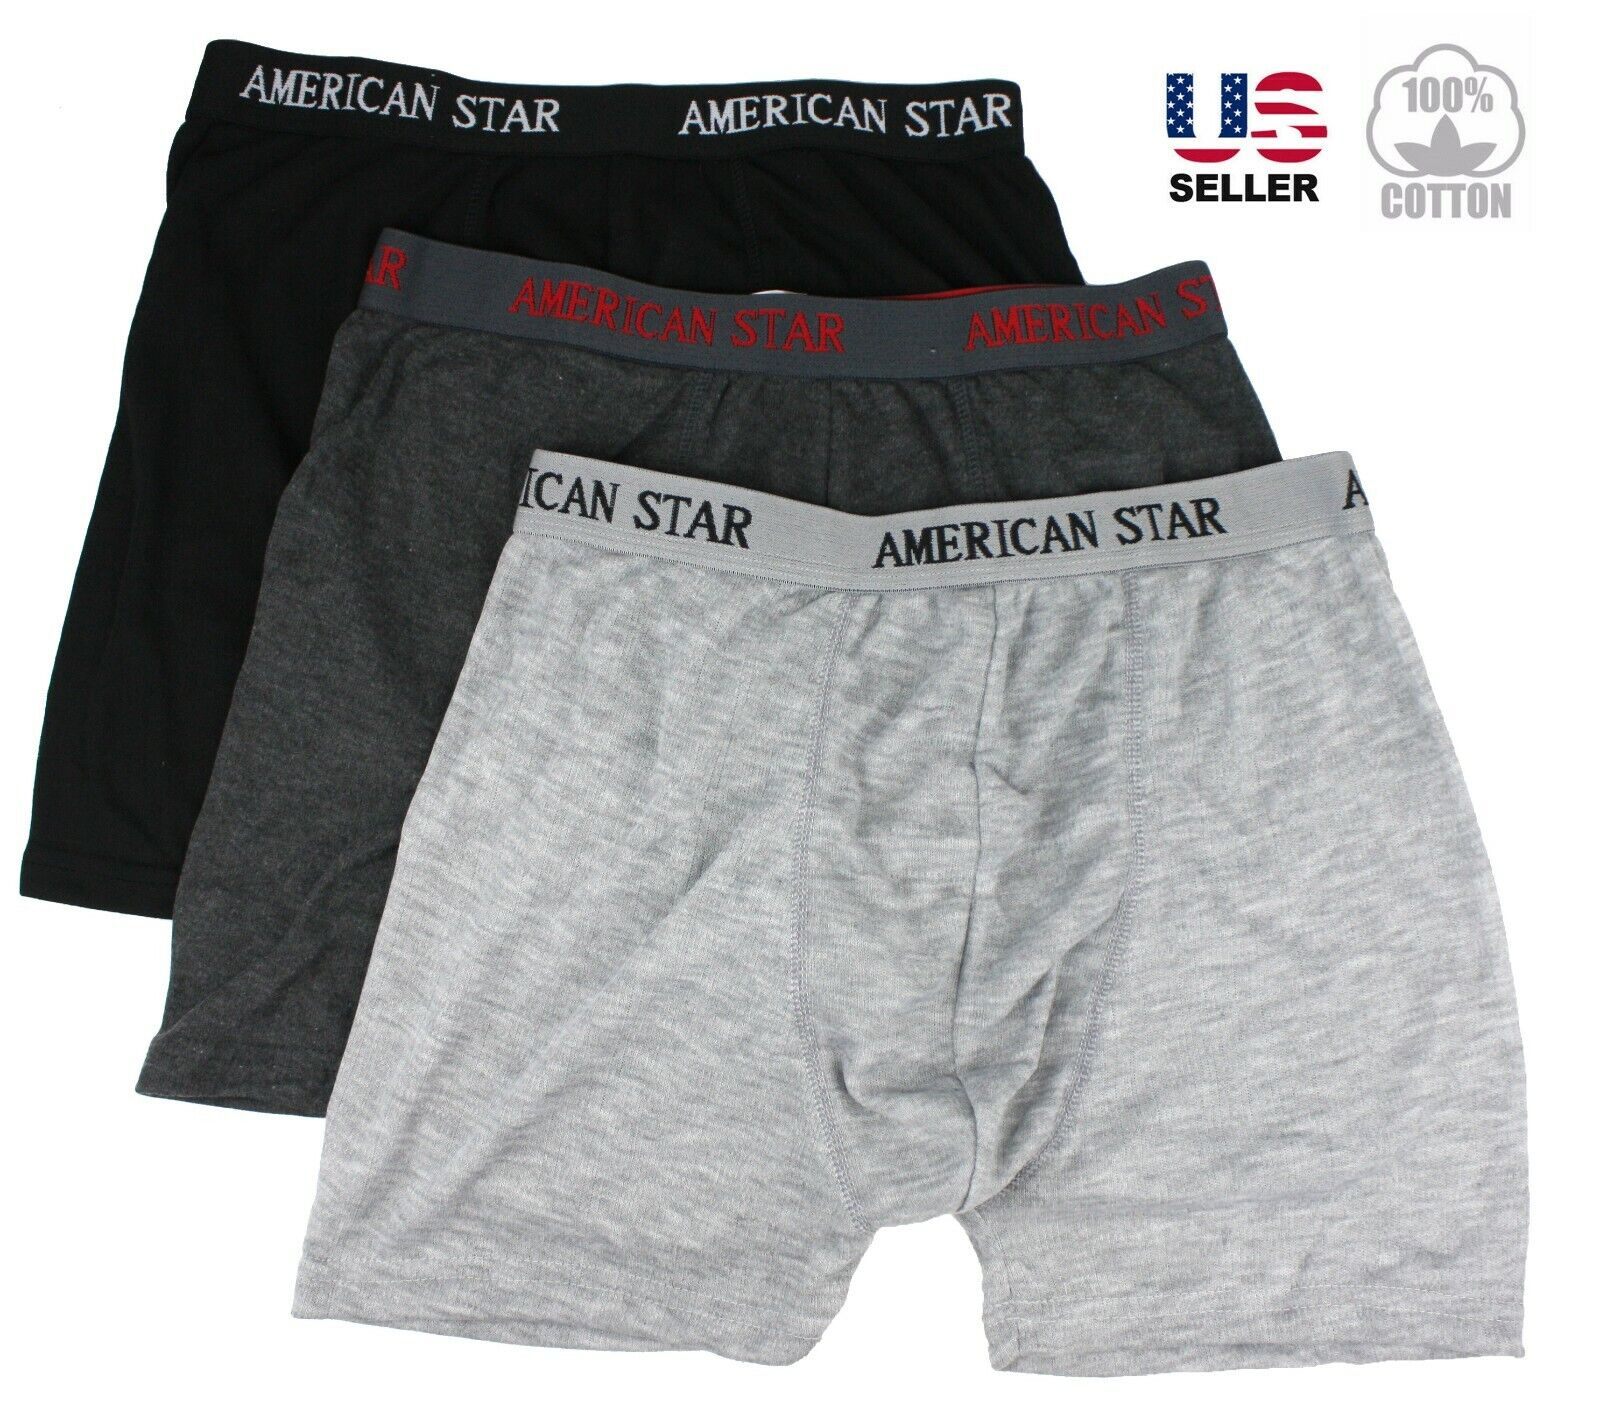 Lot 3 Mens Boxer Briefs Trunks Shorts Underwear Cotton Stret